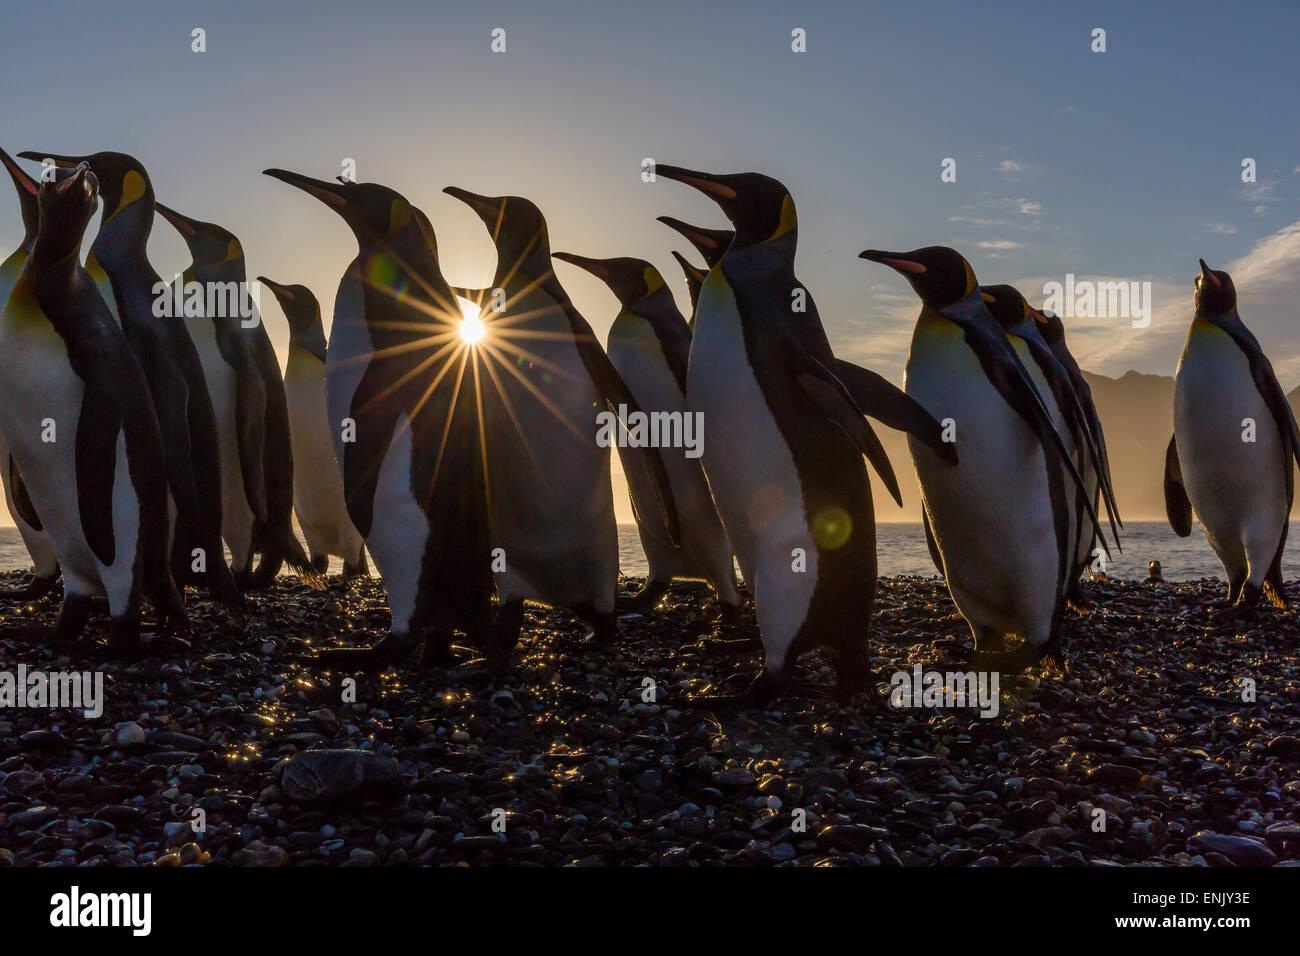 Re pinguini (Aptenodytes patagonicus) all'alba, in st Andrews Bay, Georgia del Sud e le regioni polari Foto Stock